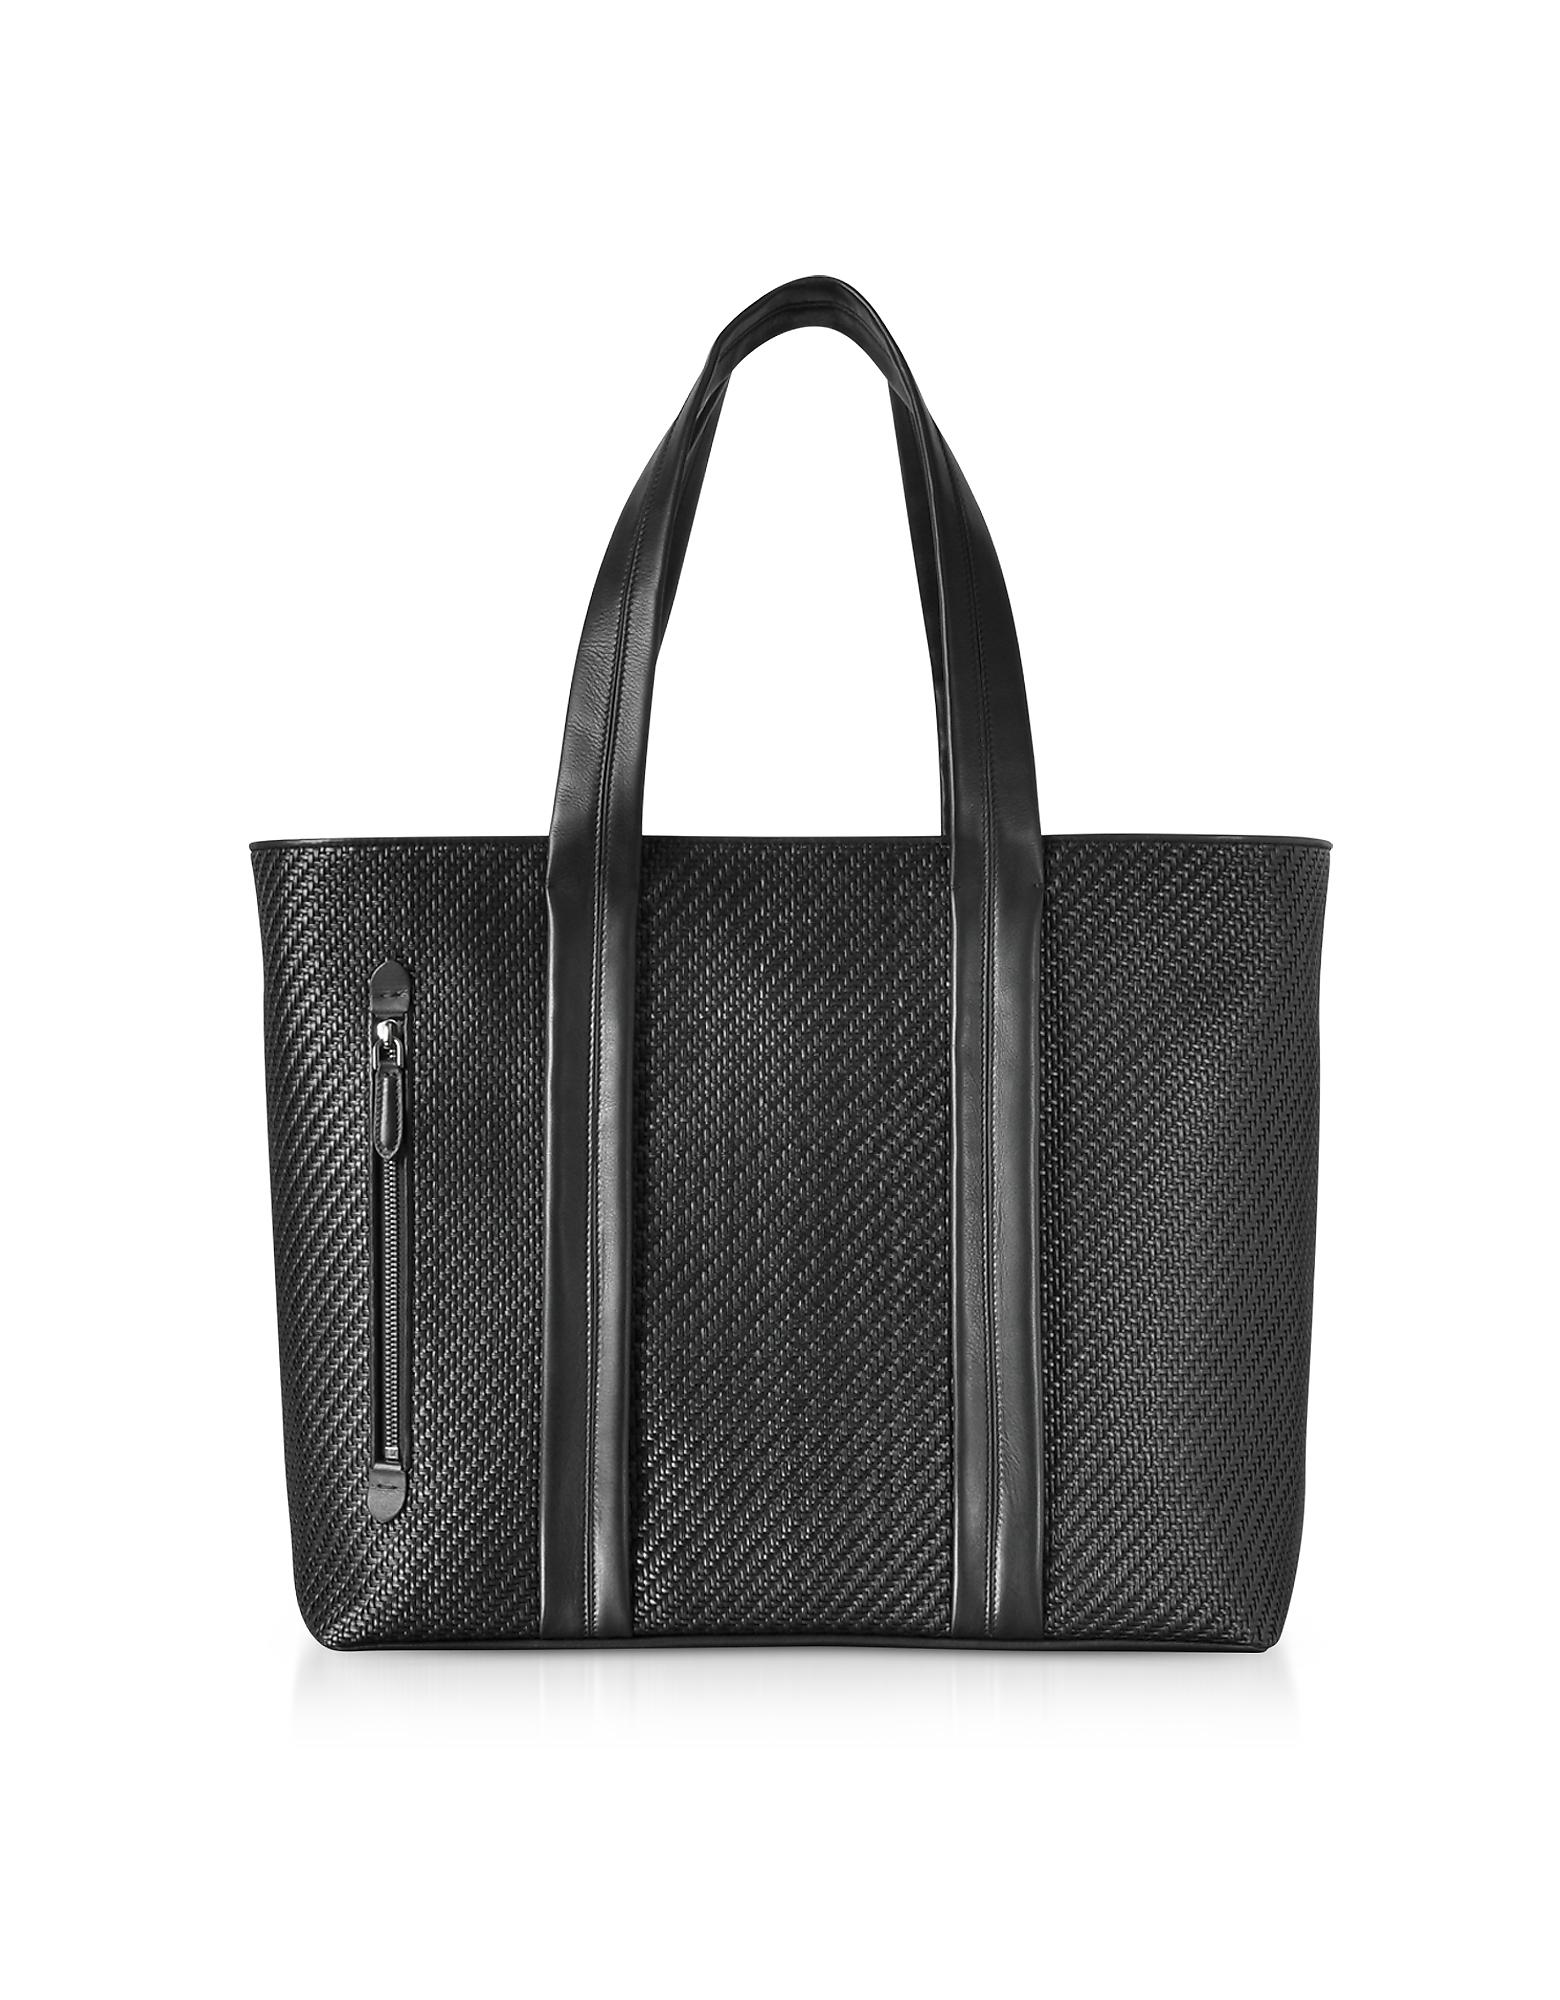 Ermenegildo Zegna Men's Bags, Black Pelle Tessuta Large Tote Bag